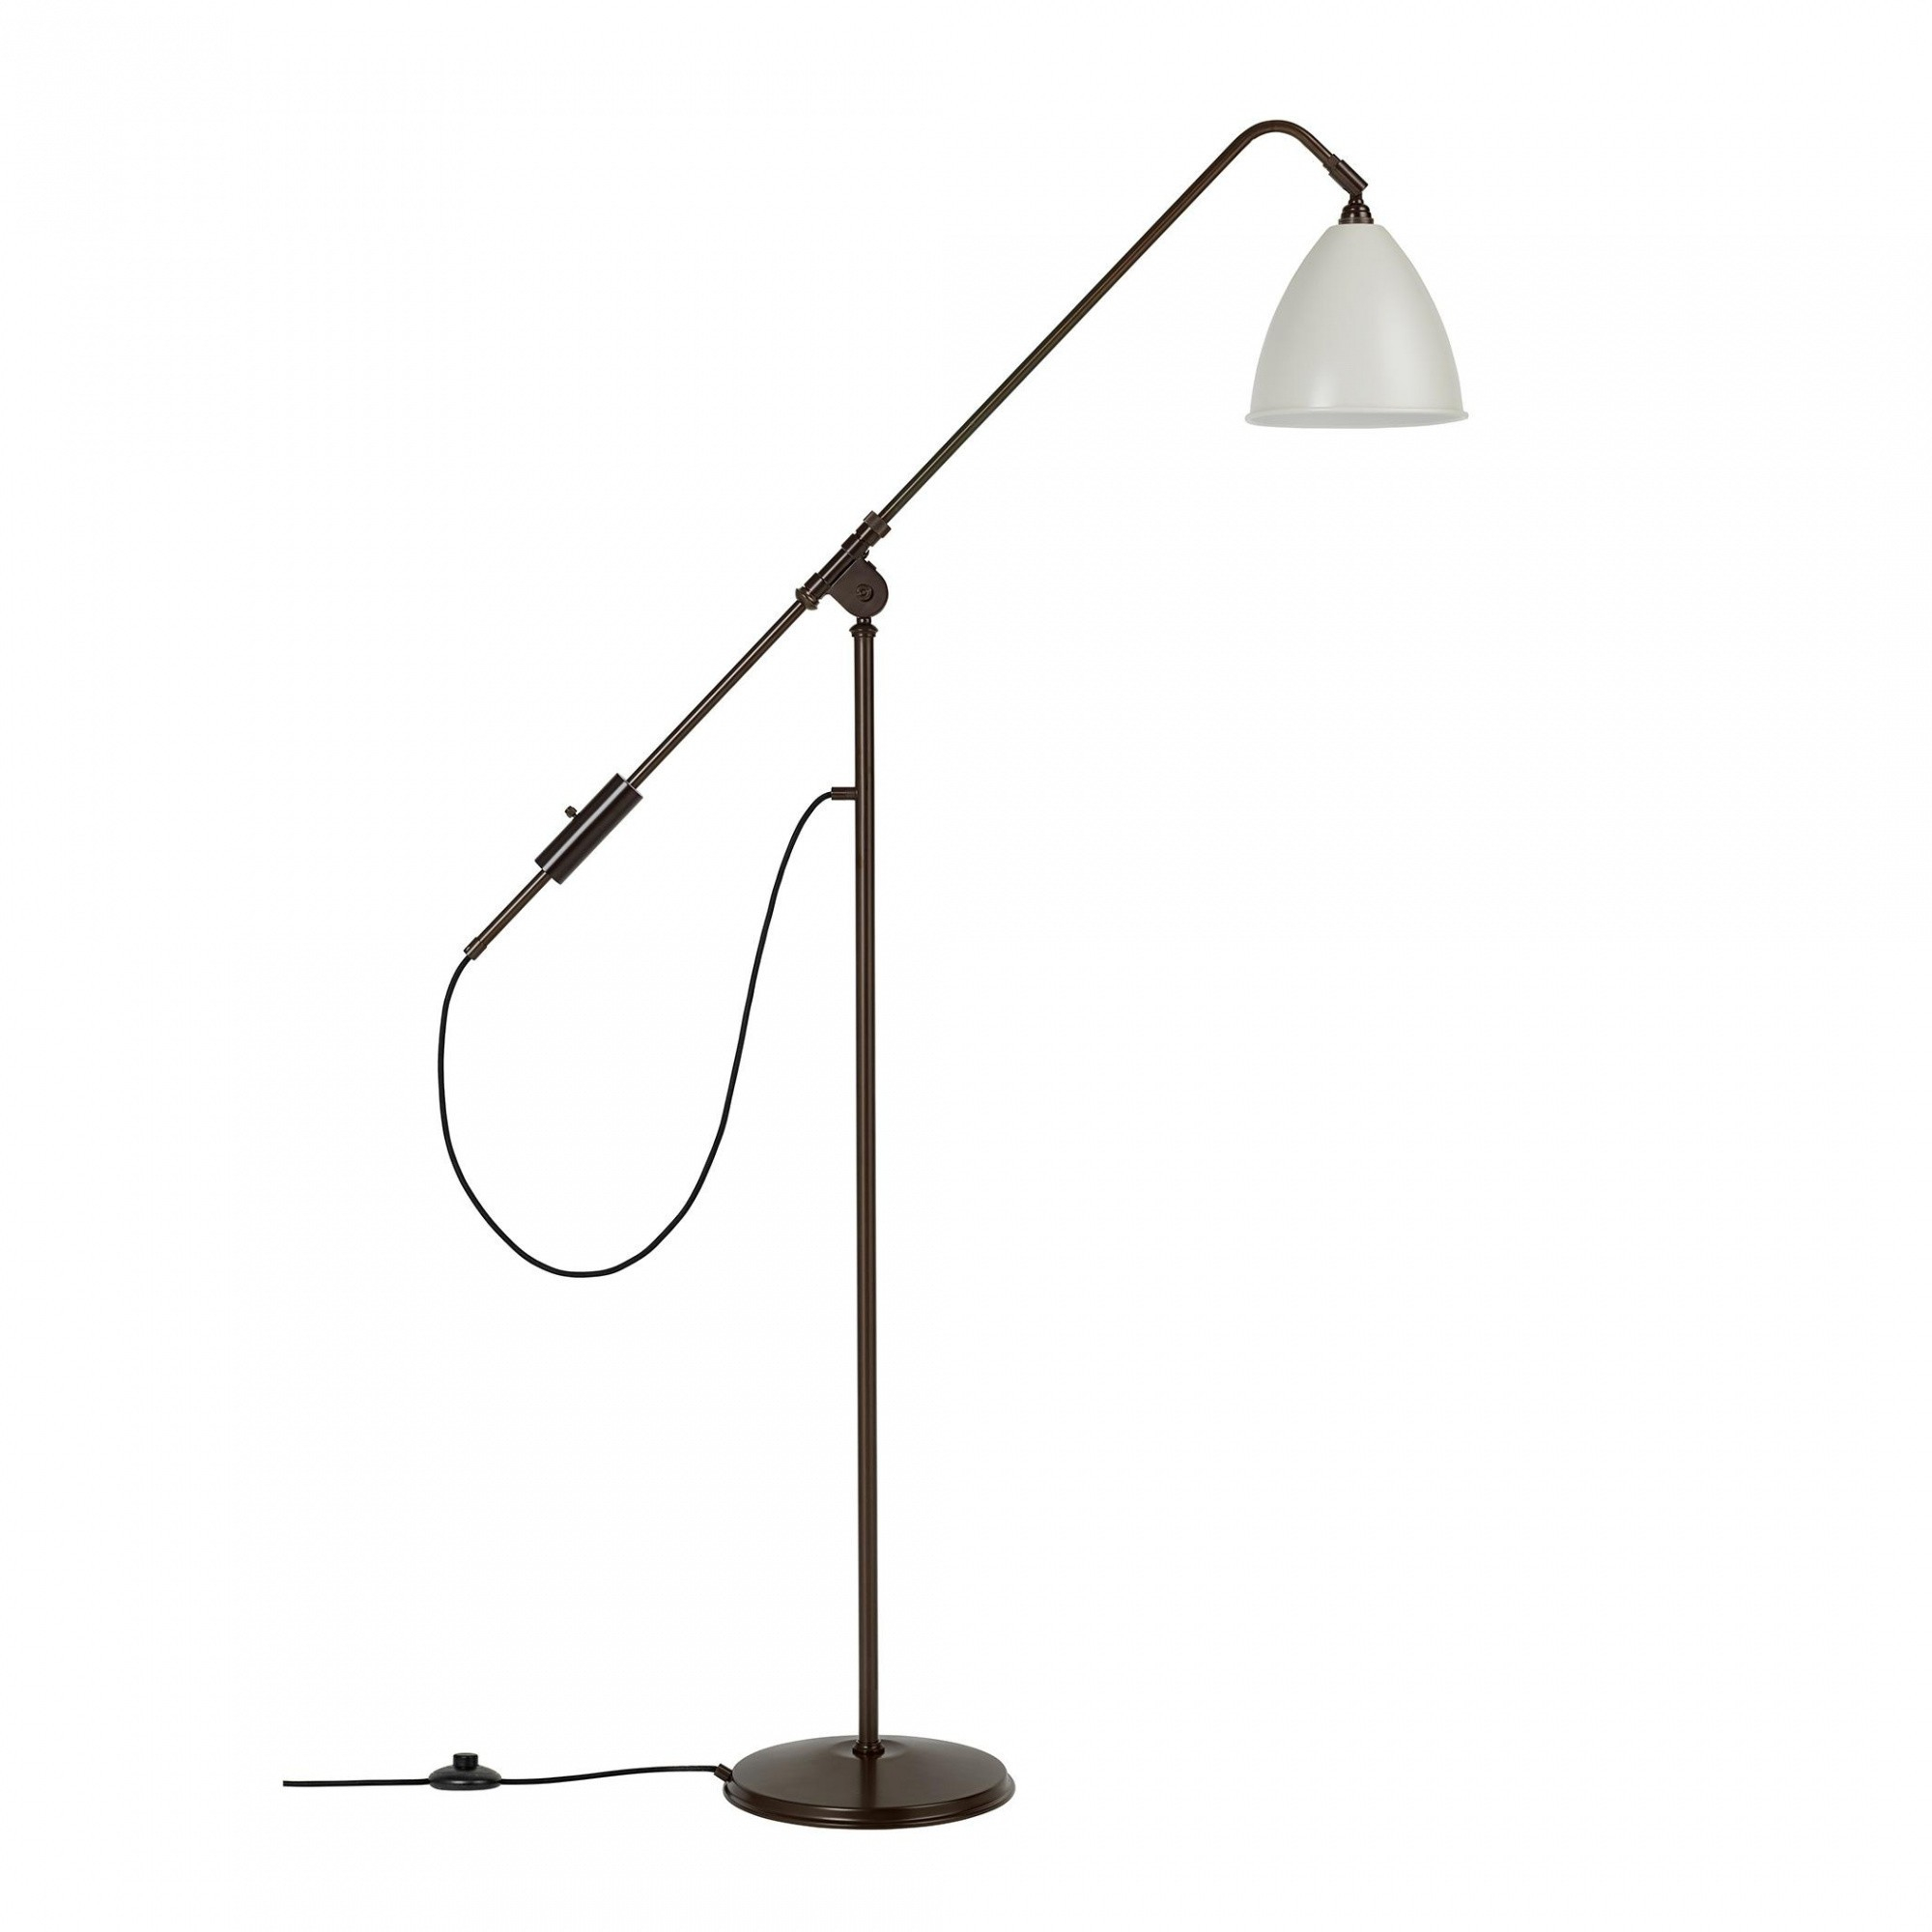 Bestlite Bl4 Floor Lamp pertaining to dimensions 2000 X 2000